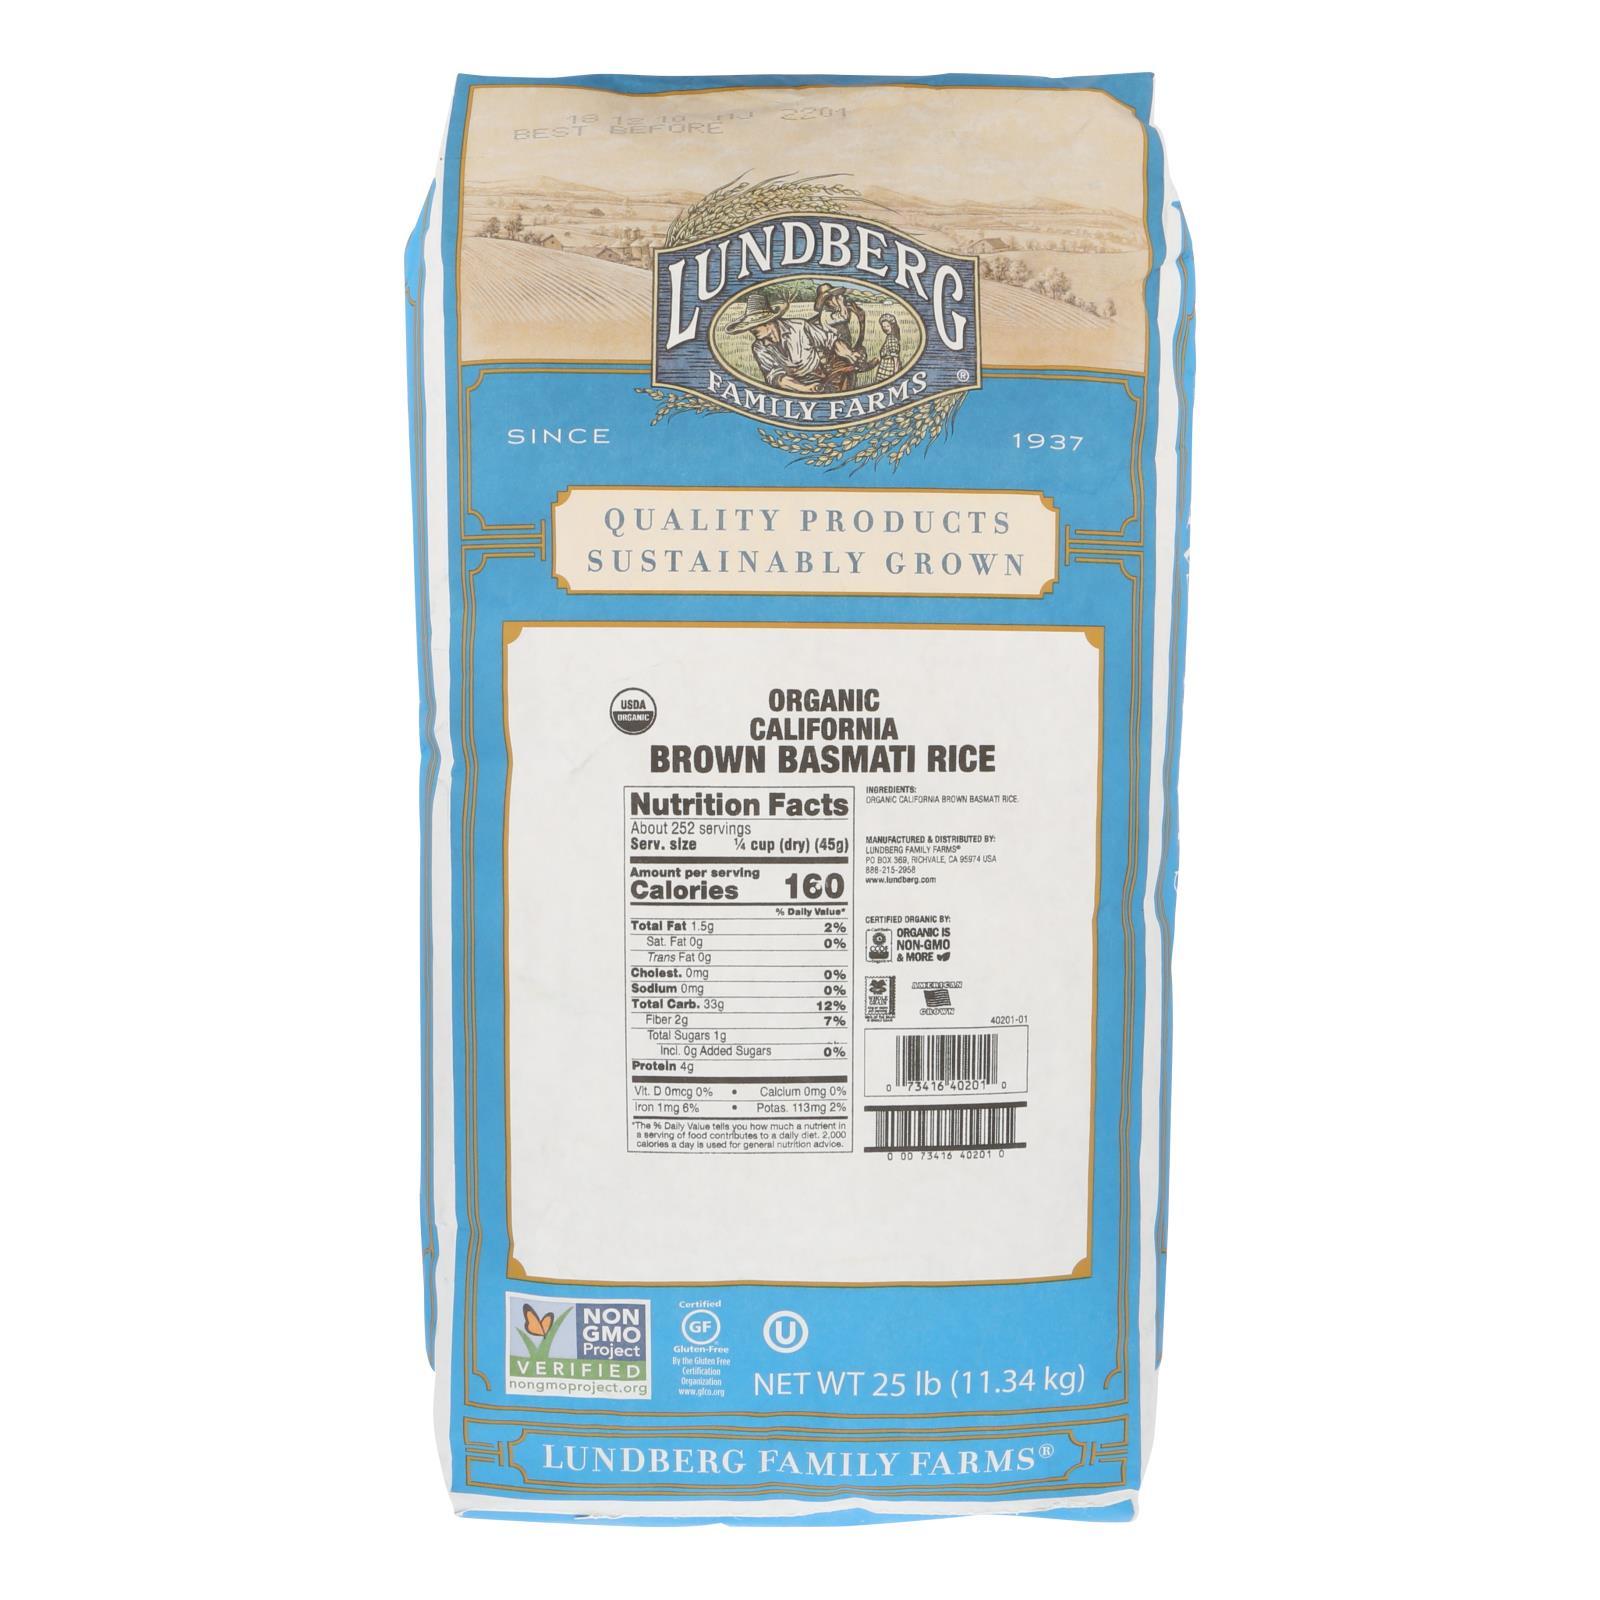 Lundberg Family Farms Organic Rice - Brown Basmati - Case of 25 lbs %count(alt)